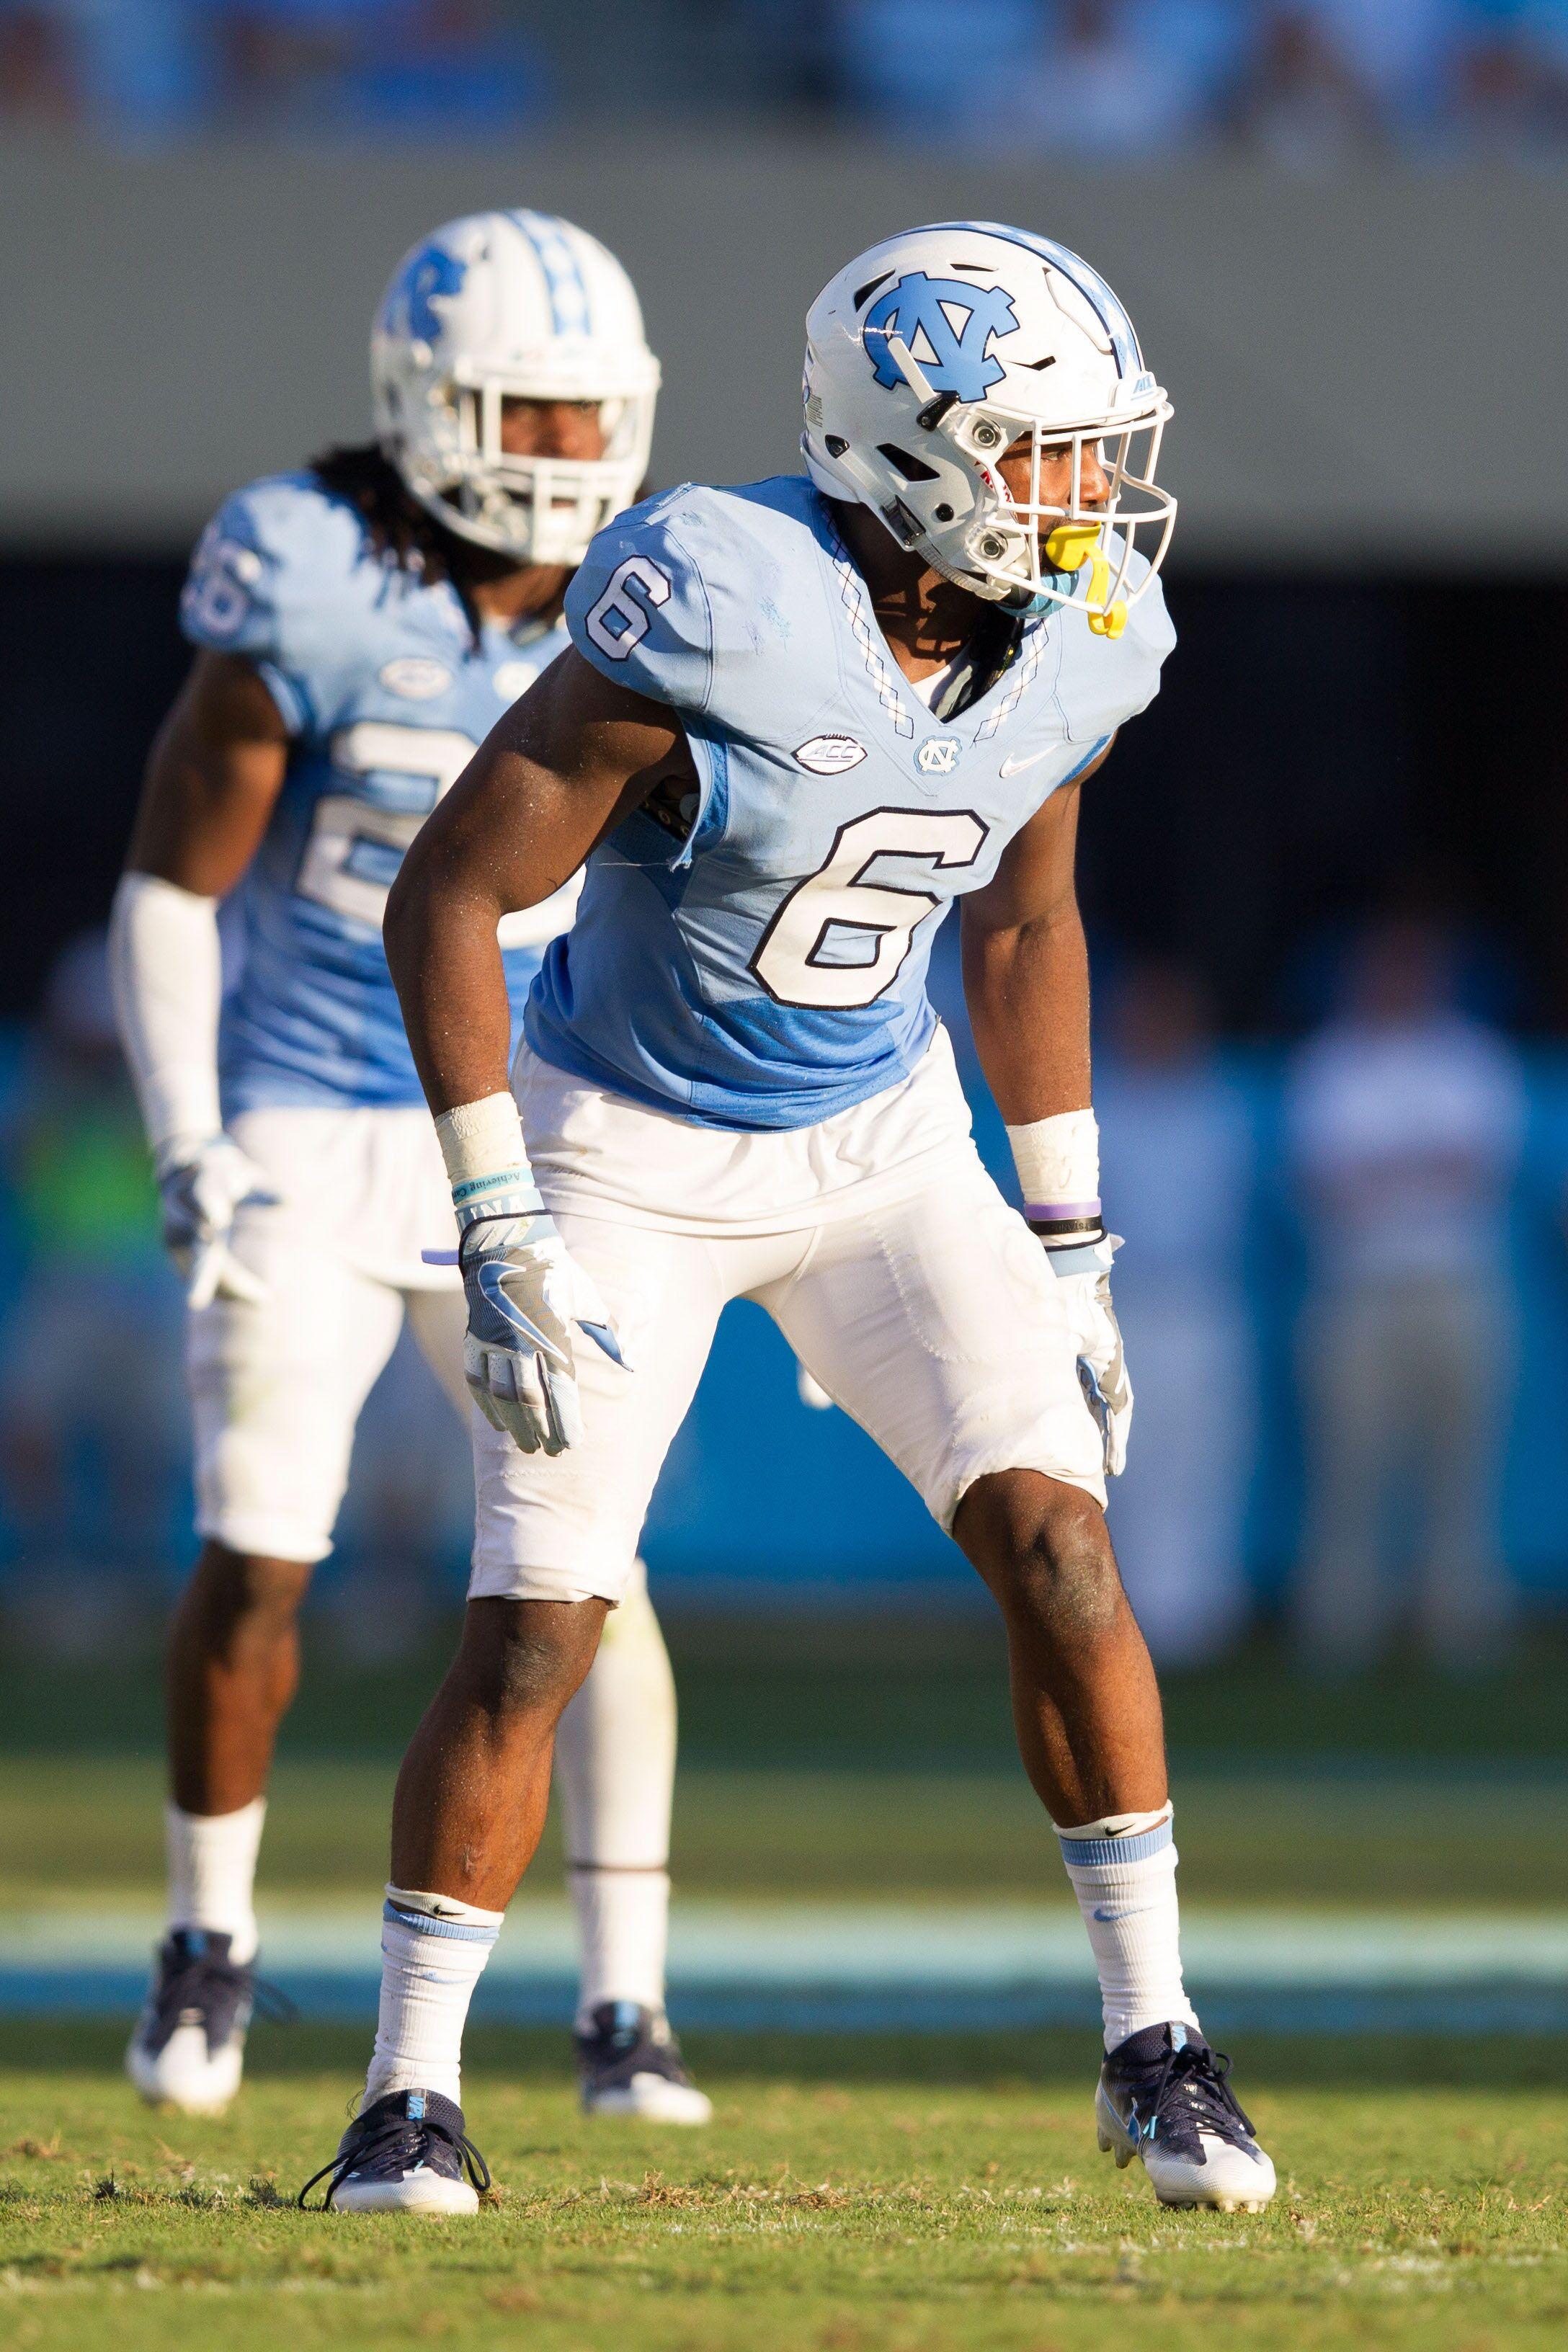 UNC Football: Athlon Sports releases preseason All-ACC teamsNorth Carolina Football Roster